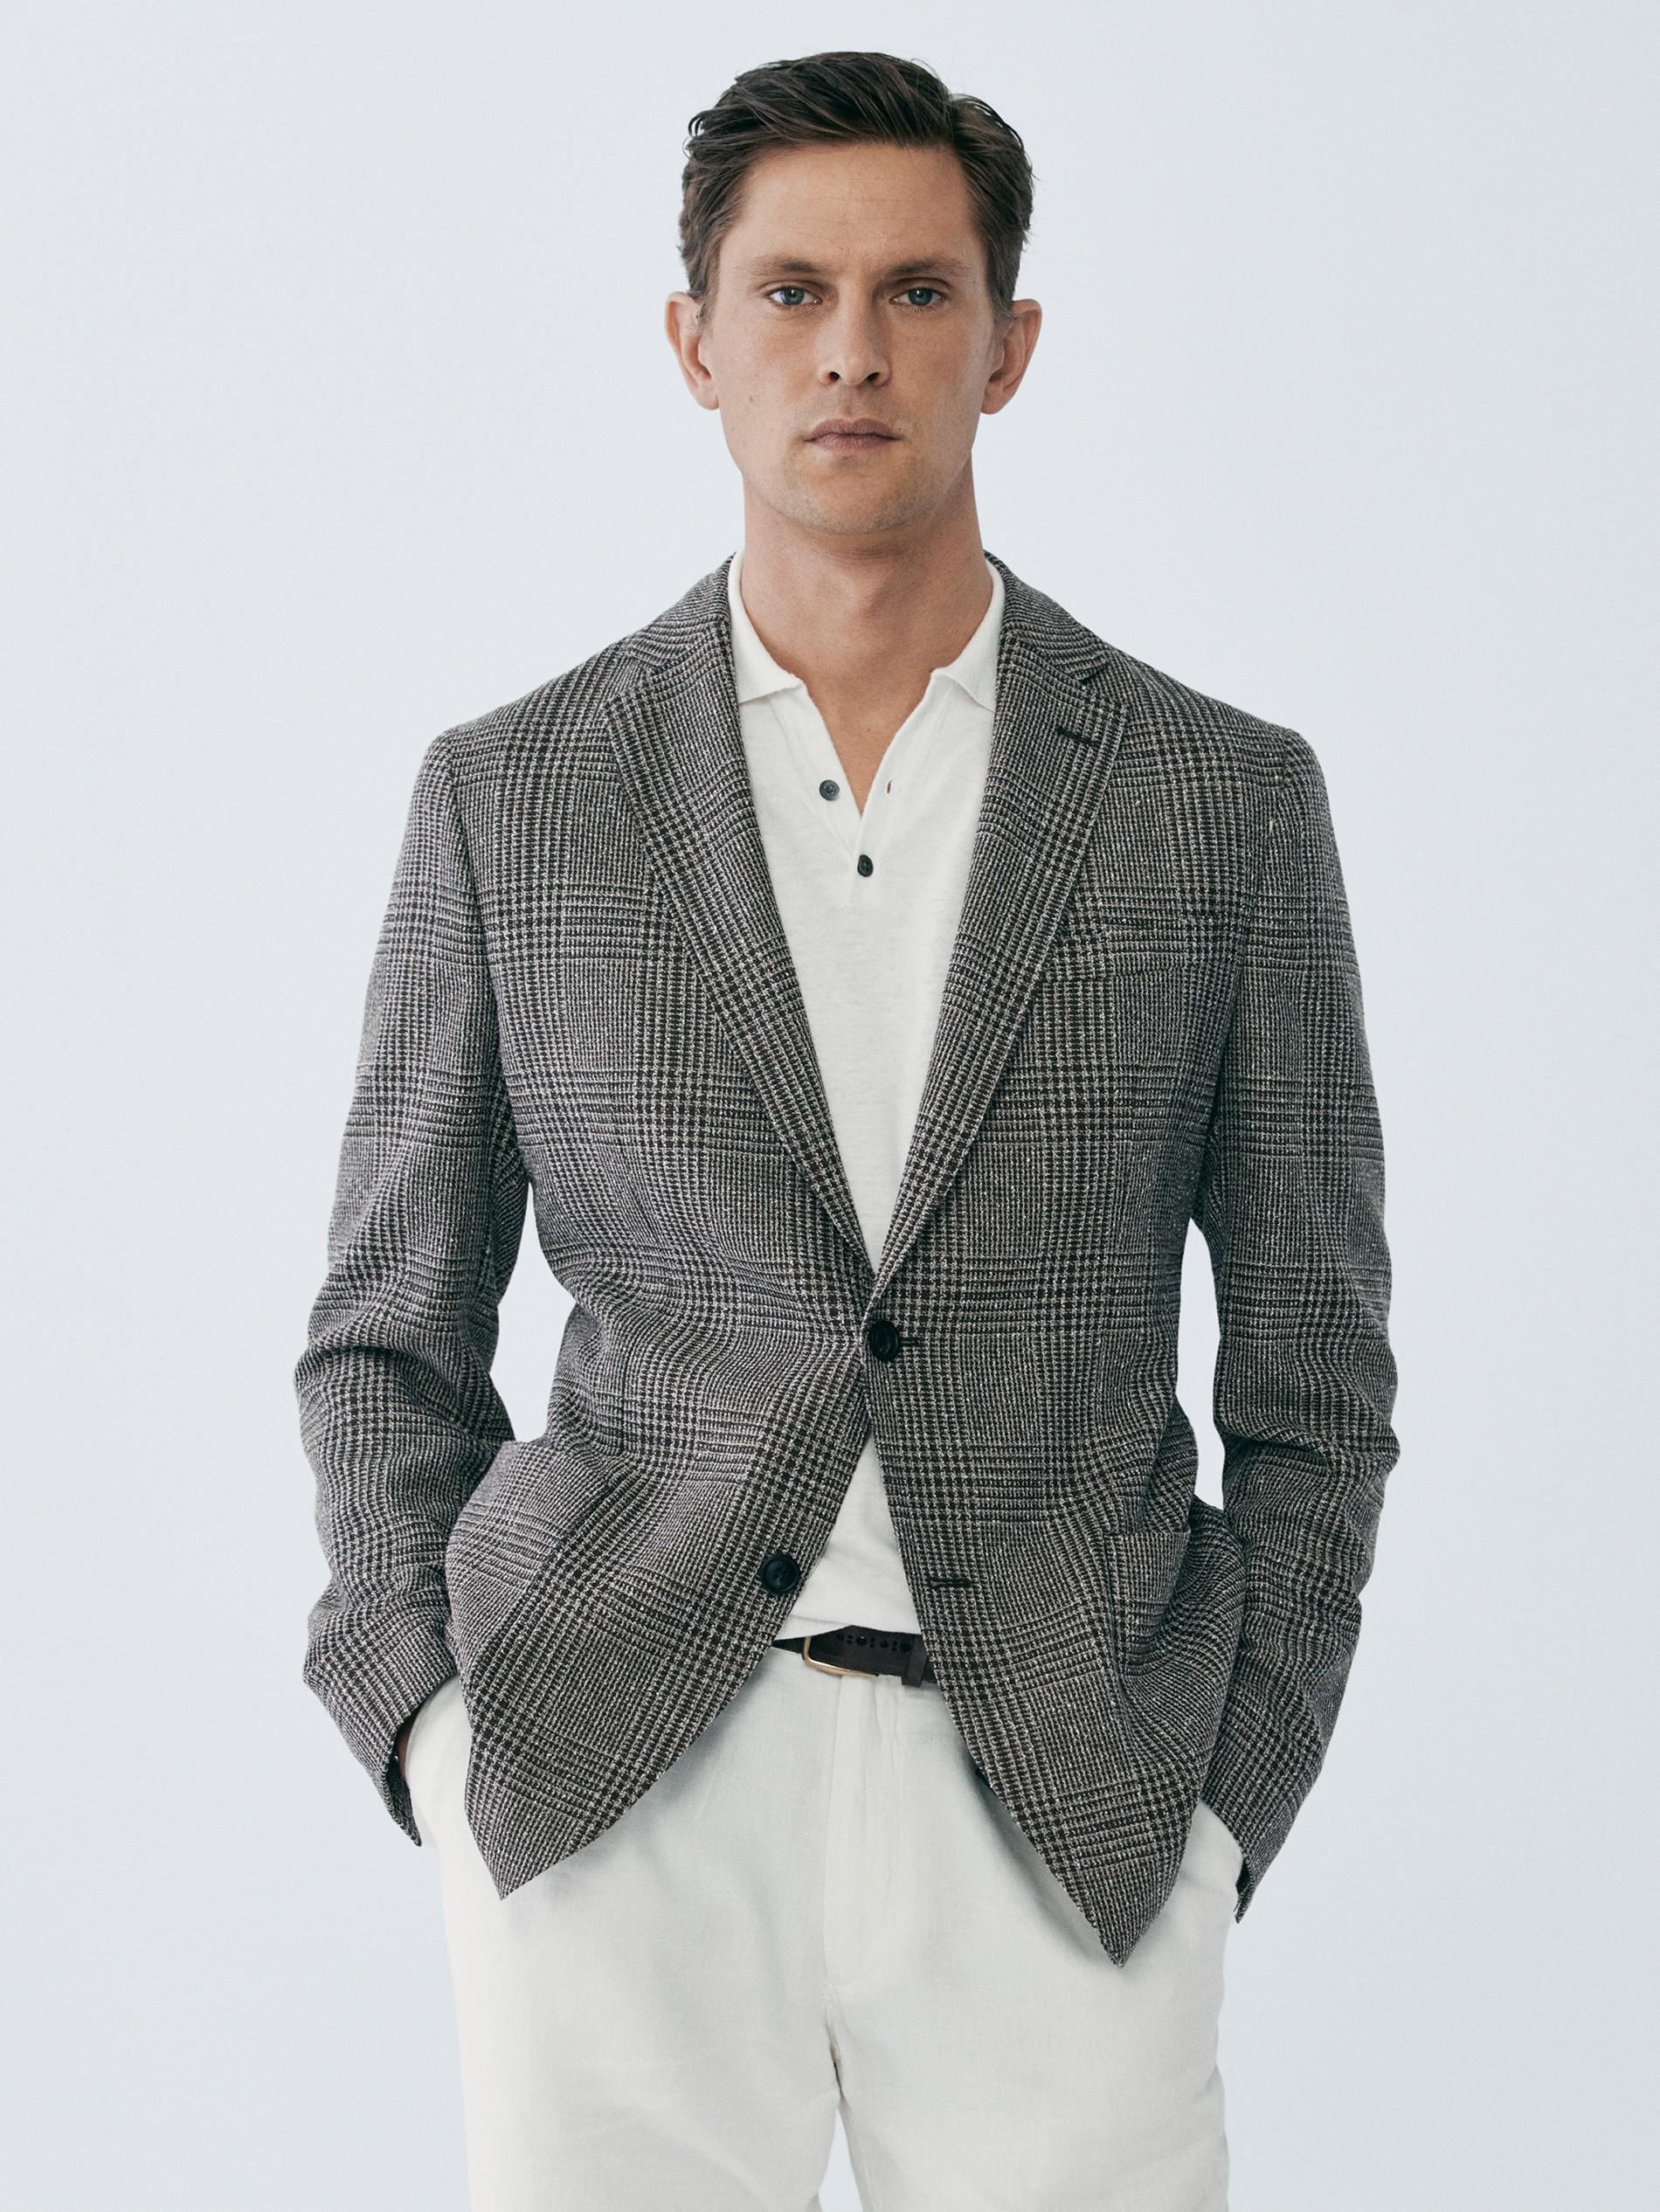 NestYu Mens Notch Lapel Patch Slim Fit Suit Coat Jacket Blazer Outwear